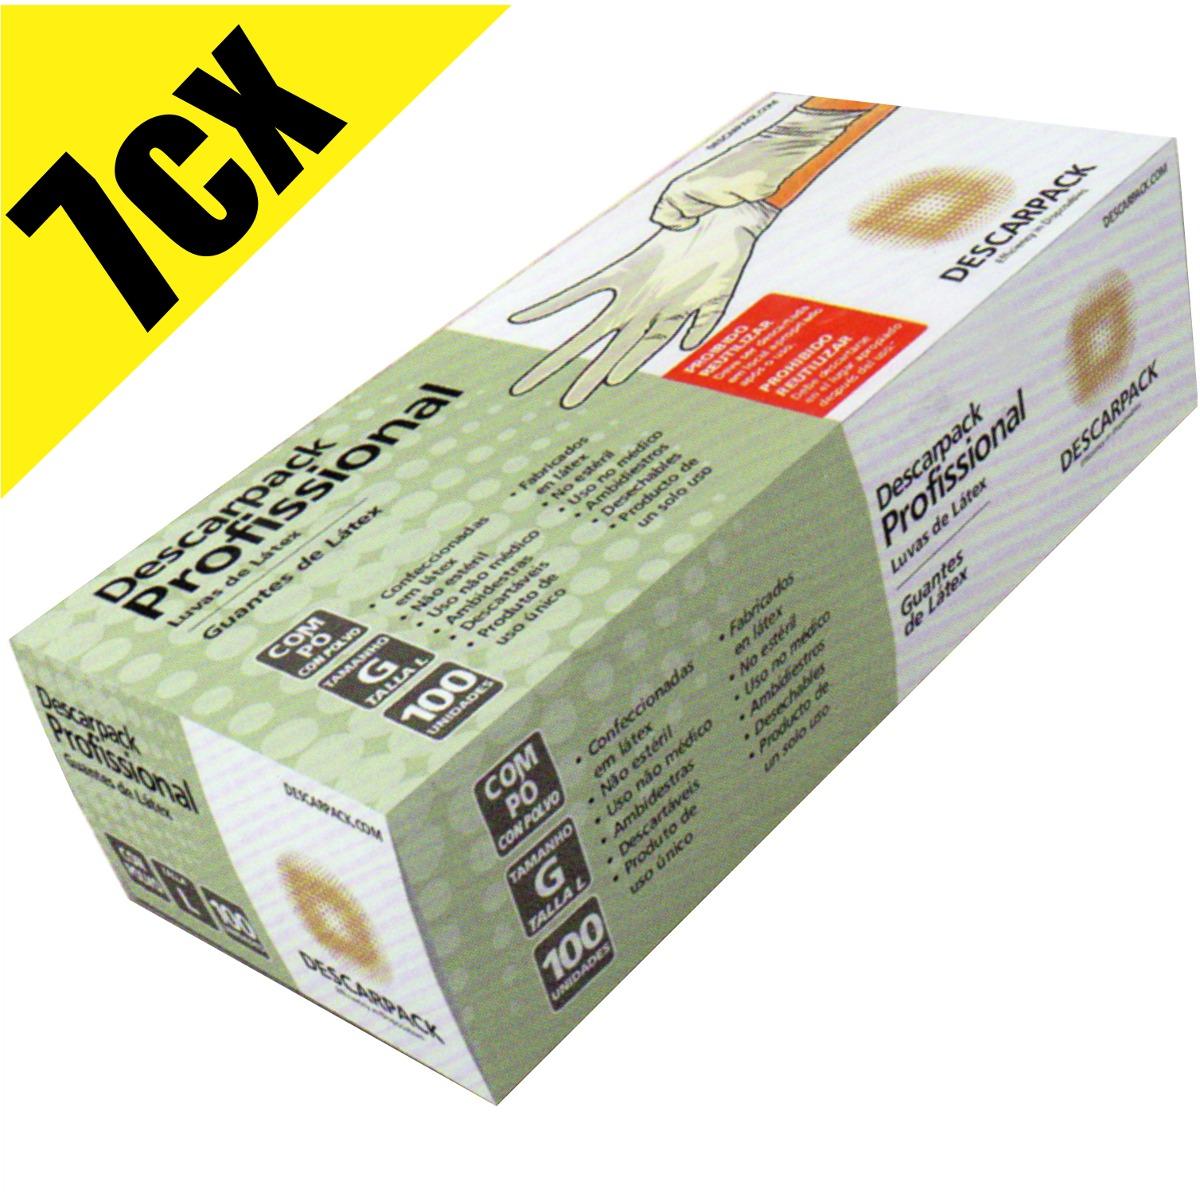 4378150a41fc2 luva procedimento latex descarpack caixa com 700 luvas. Carregando zoom.